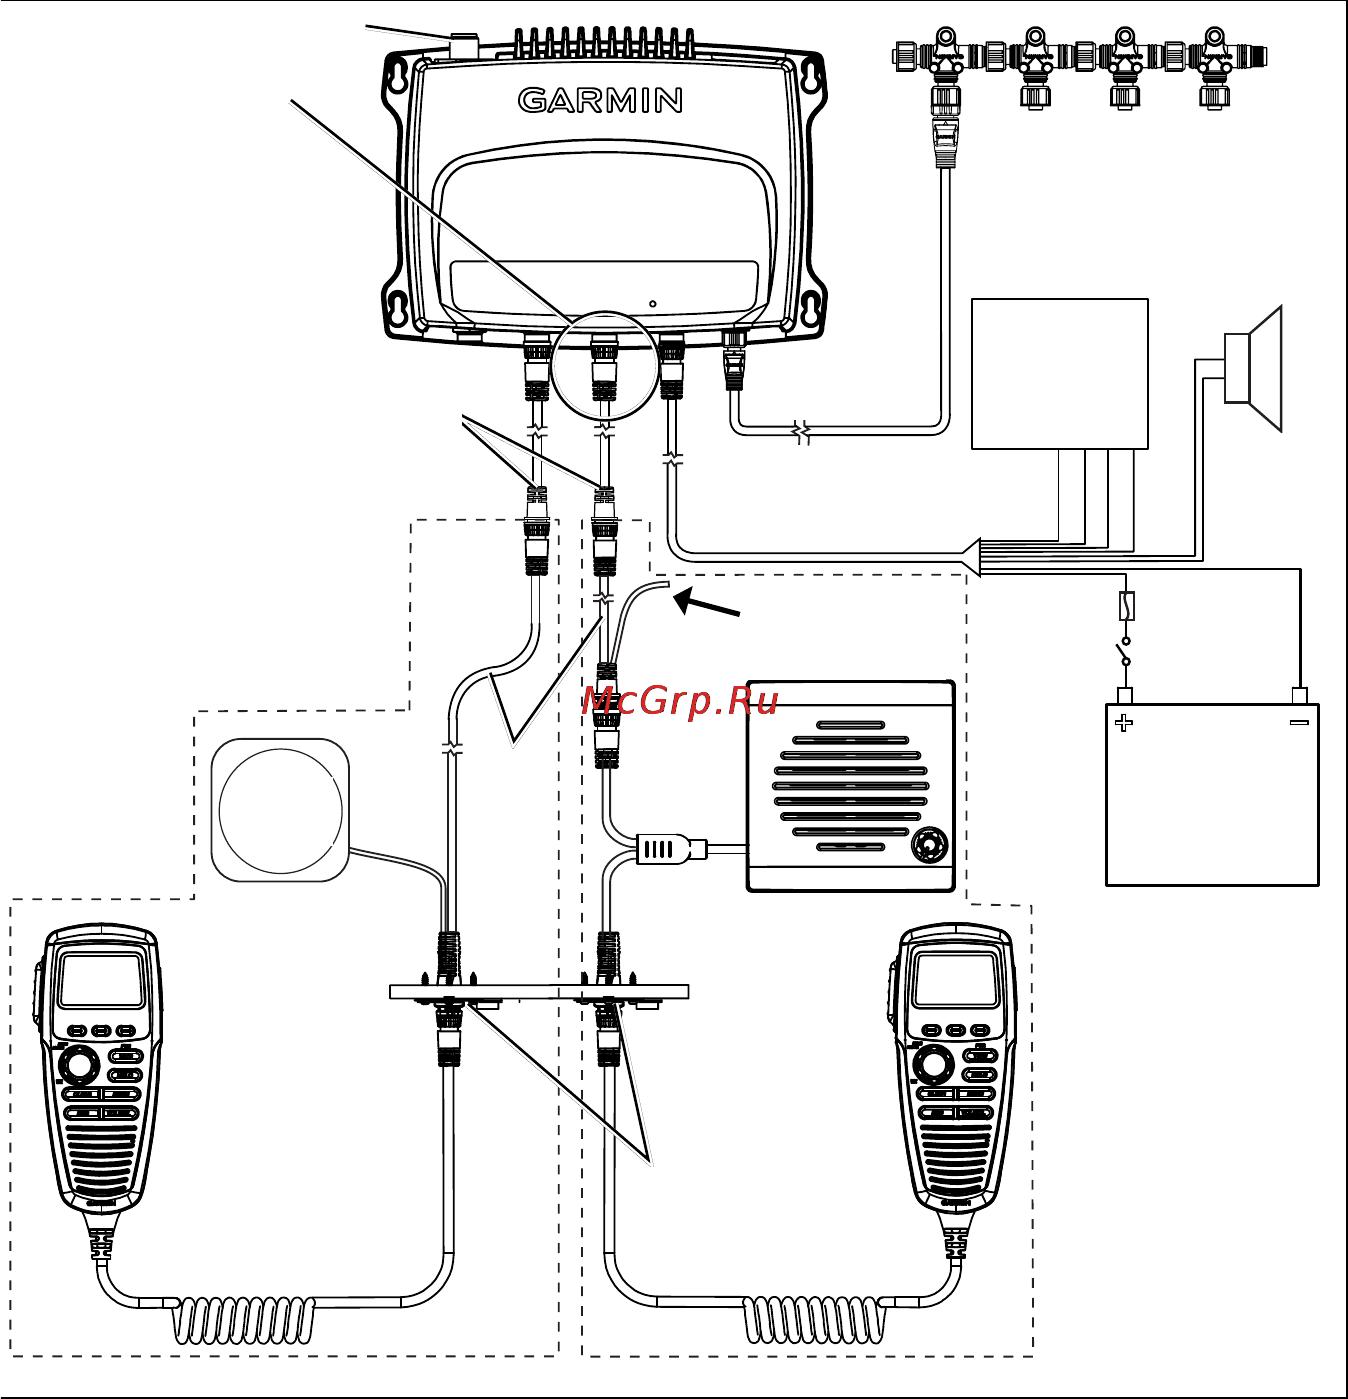 hight resolution of vhf 300 3 vhf 300 series installation instructions